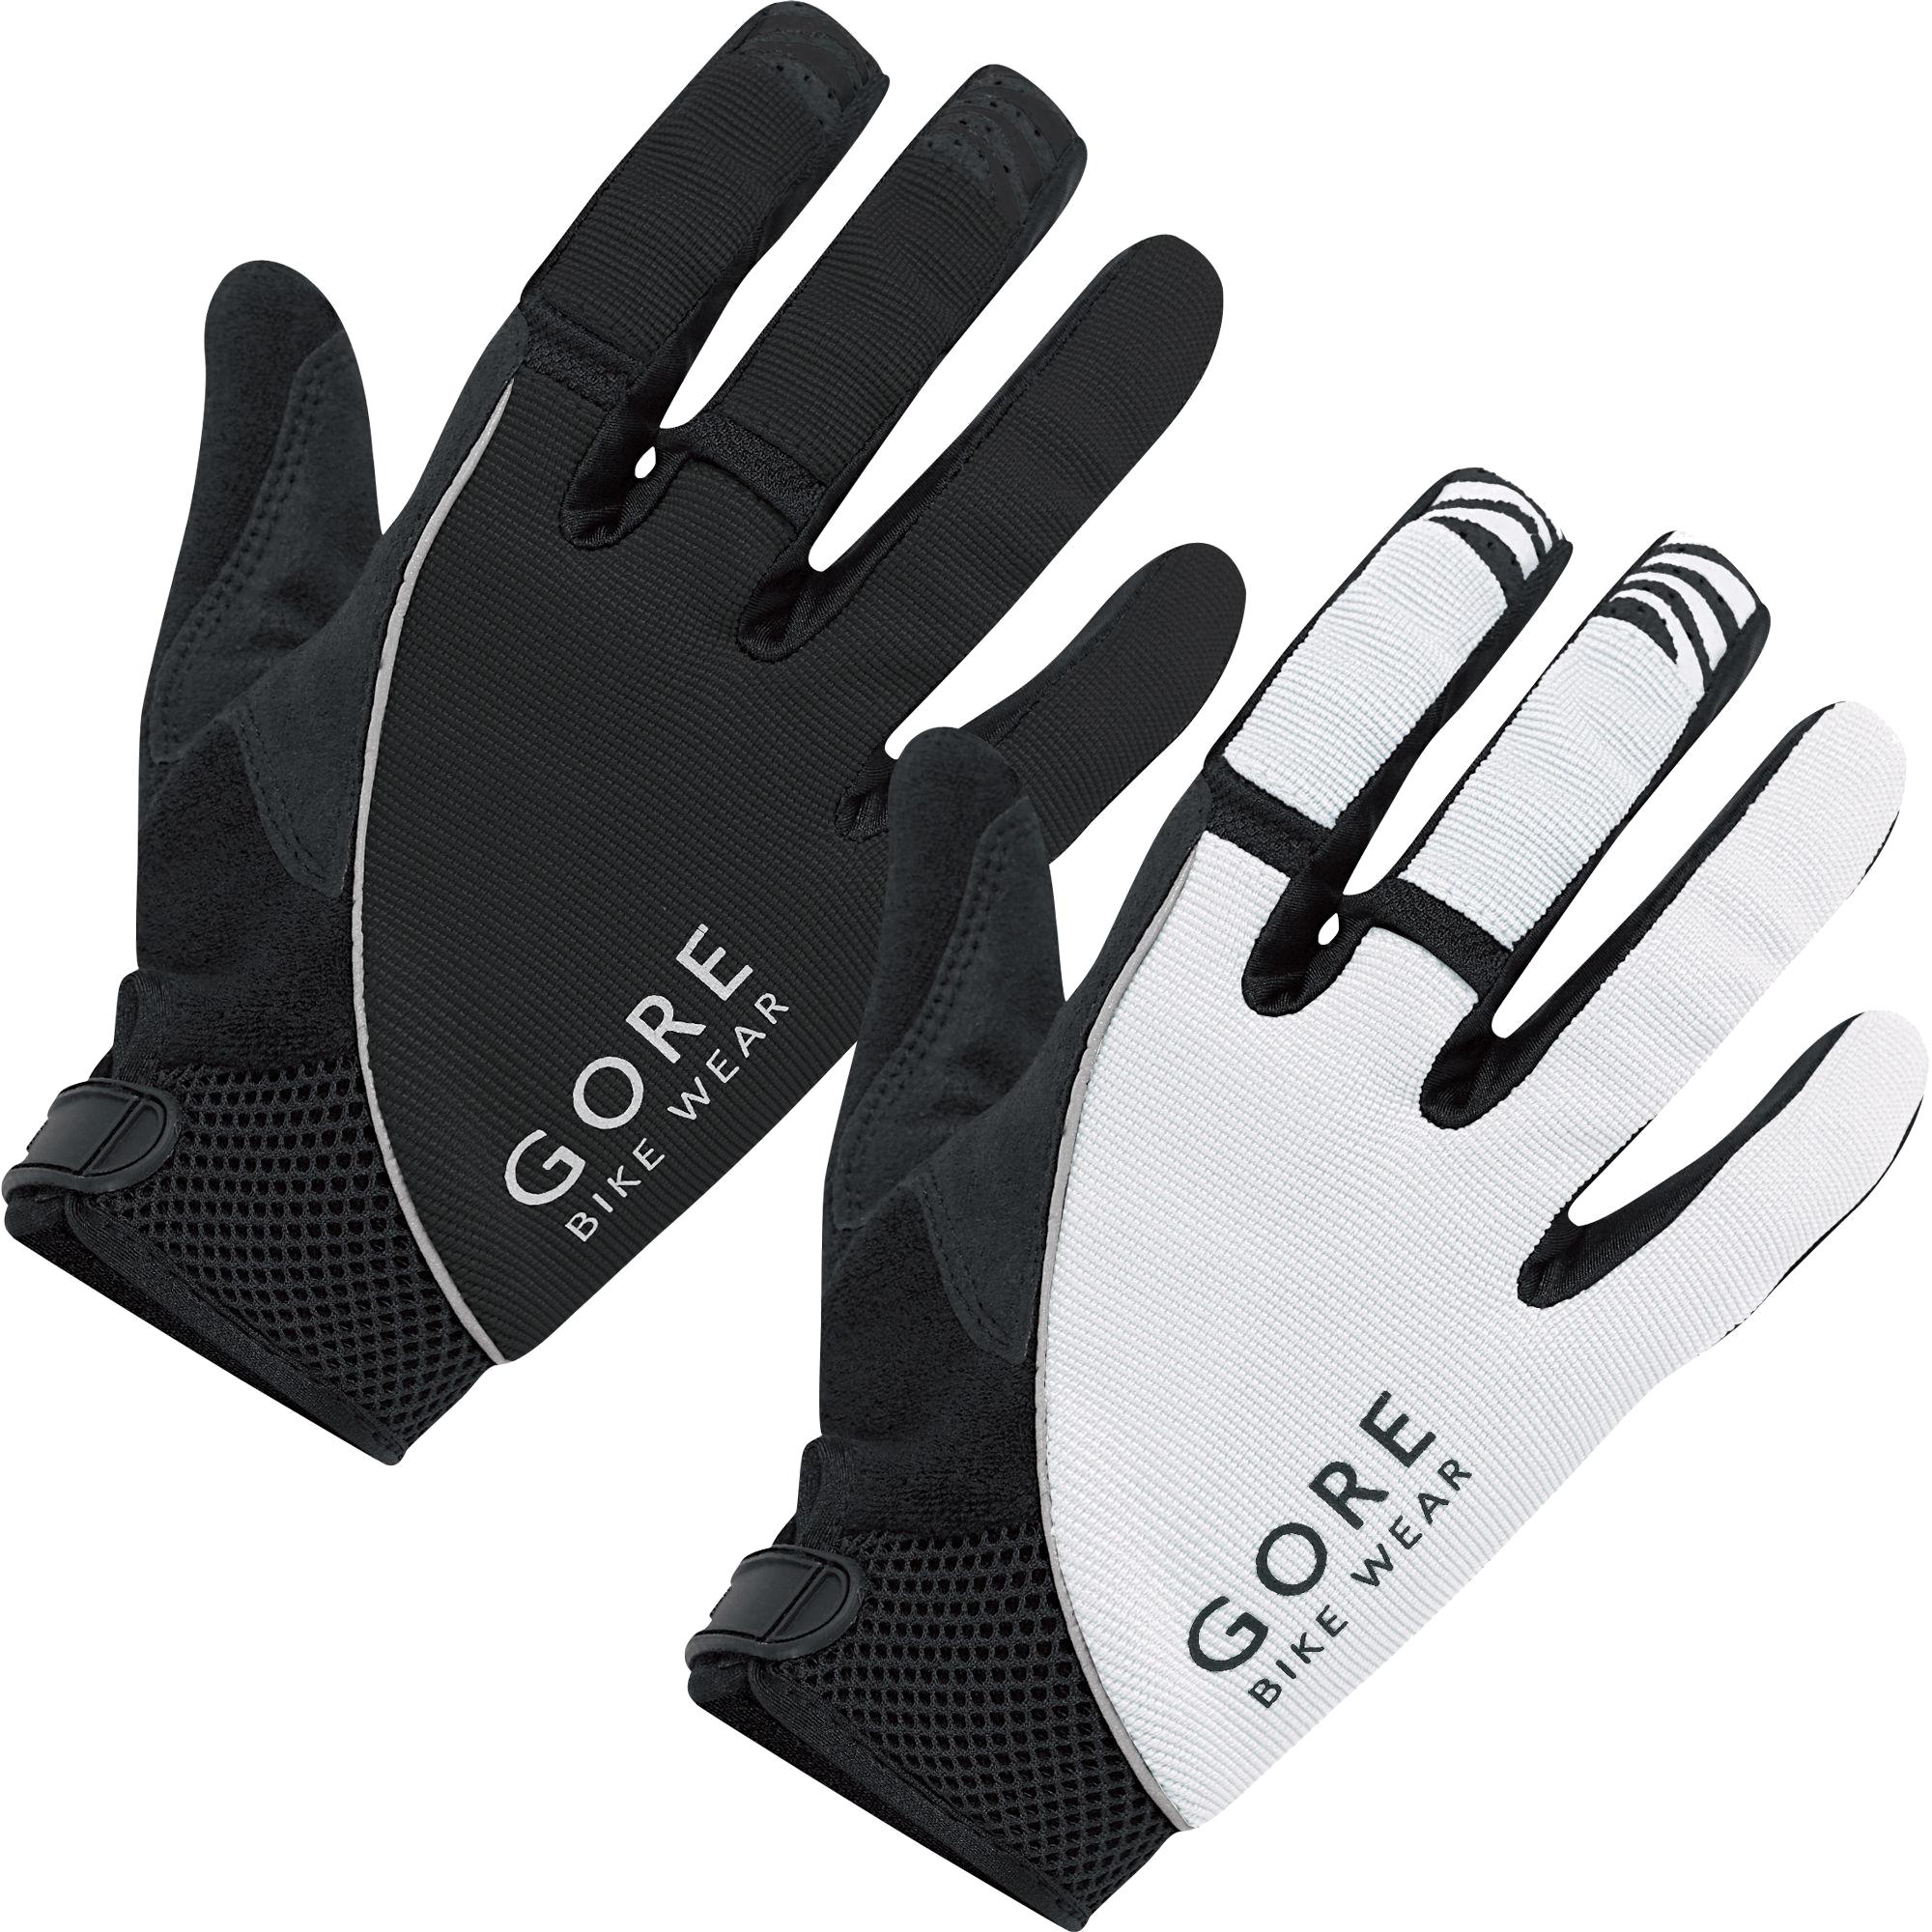 Gloves clipart kitchen glove. Black white png image